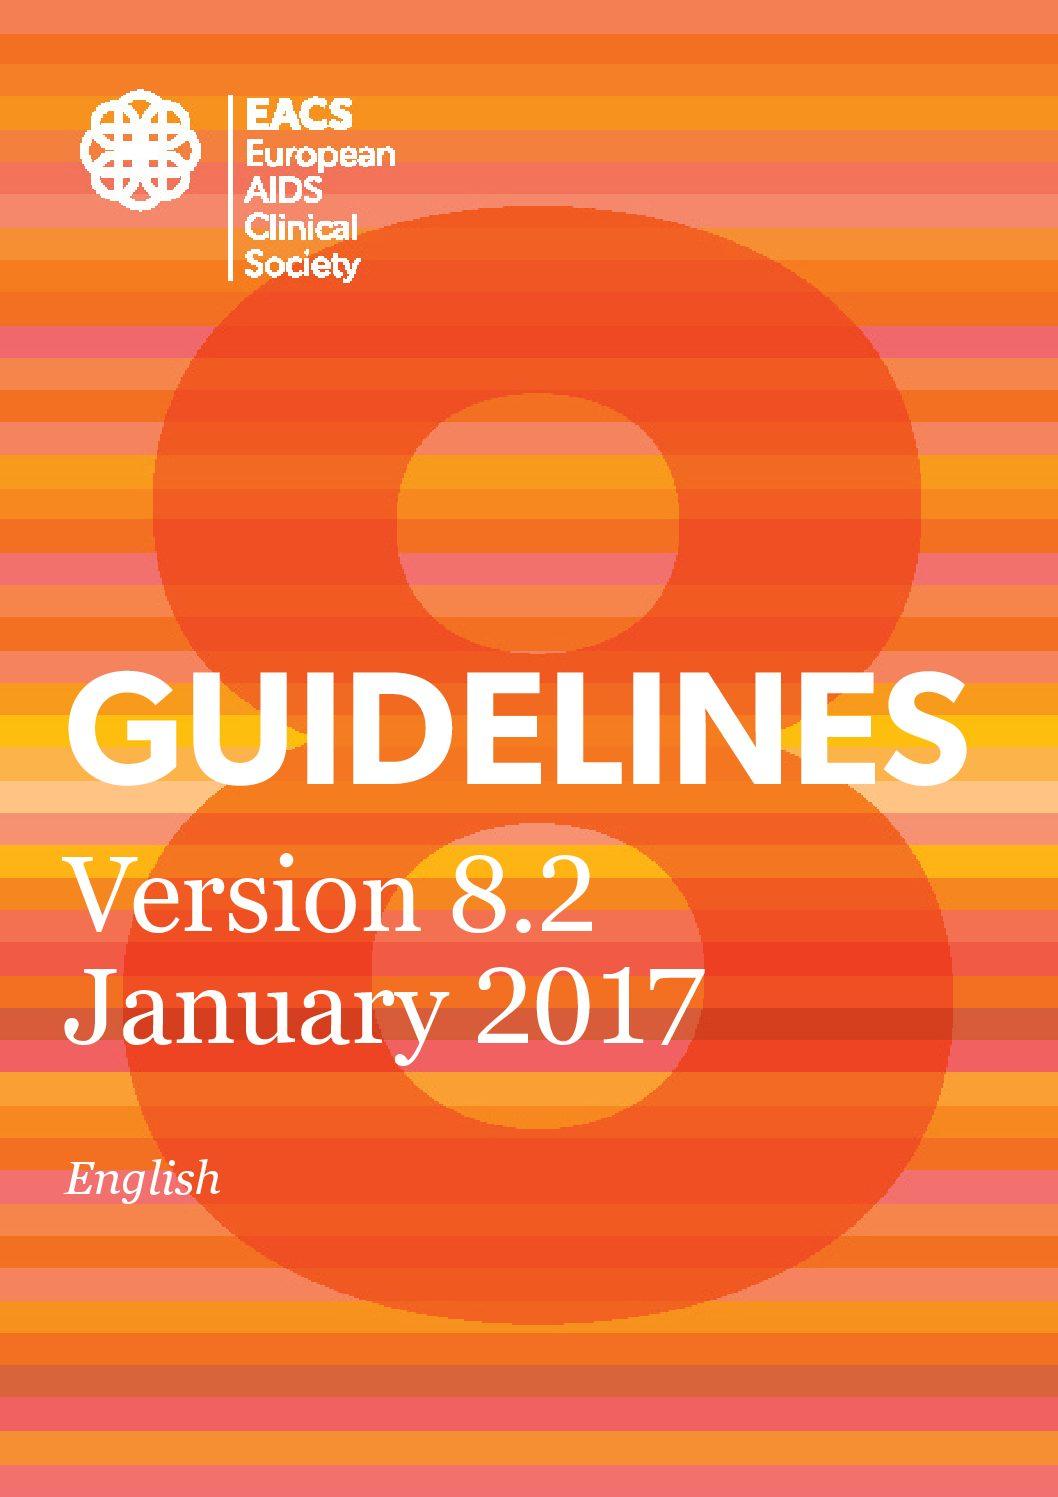 EACS guidelines 8.2 January 2017